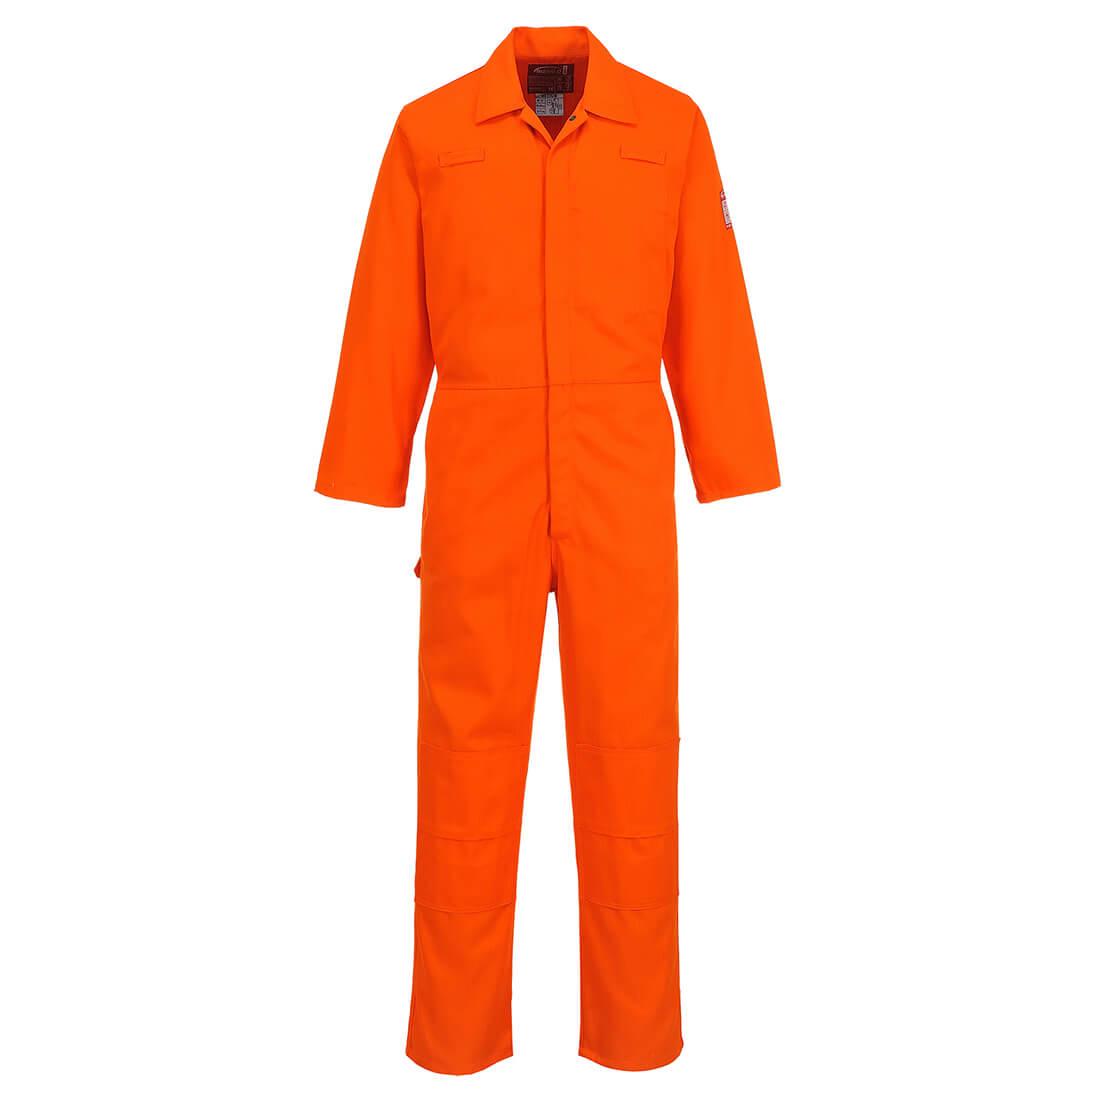 Image of Biz Weld Mens Flame Resistant Mole Skin Coverall Orange 2XL